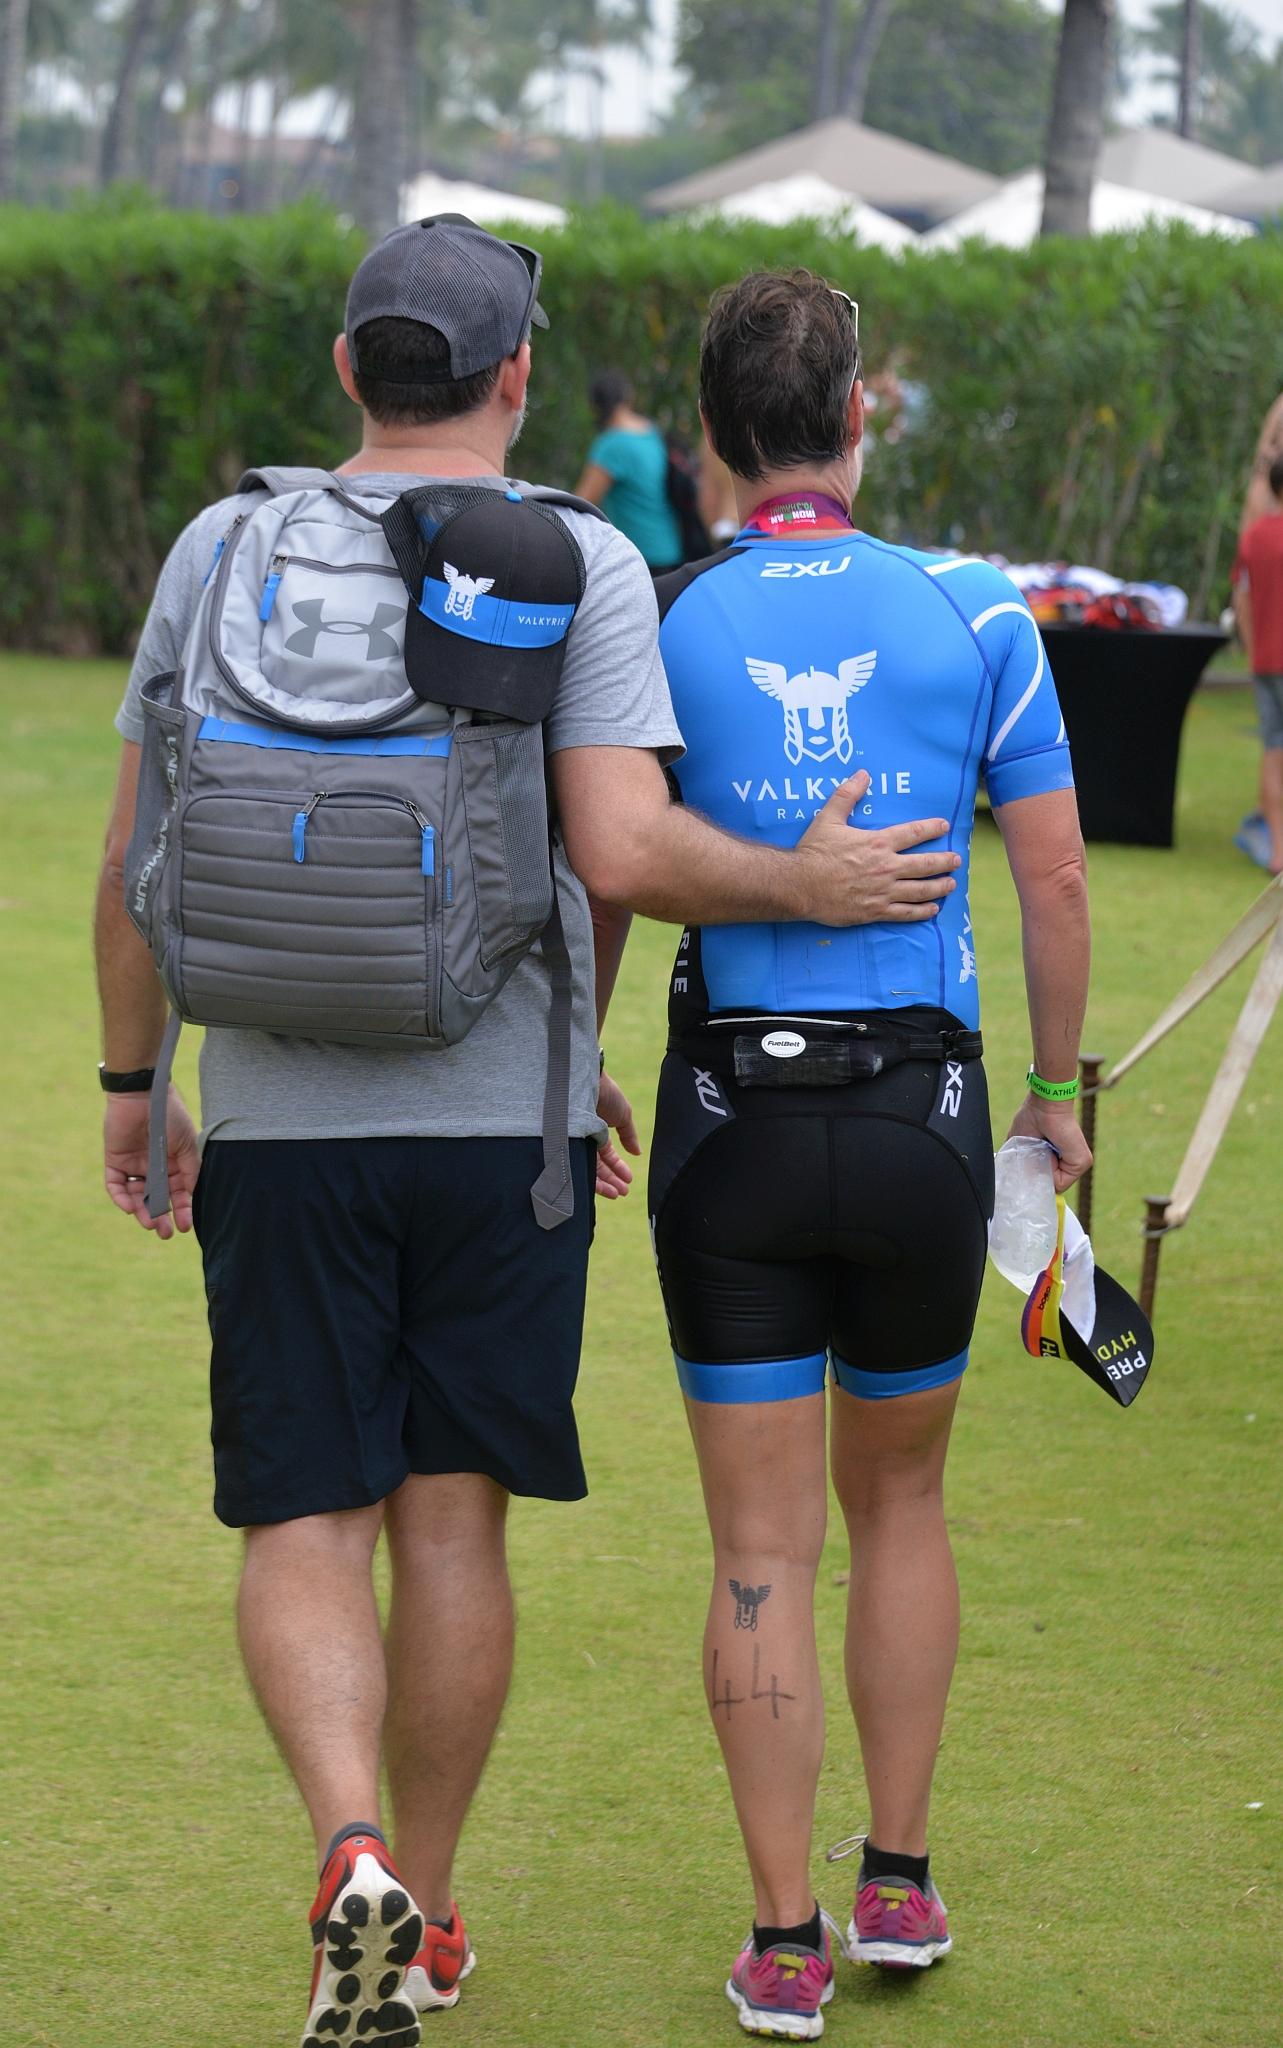 Coach_Terry_Wilson_Gemma_Hollis_Ironman_Hawaii_70.3_Push_Glide_Kick_E3TS_E3_Training_Solutions_10.JPG